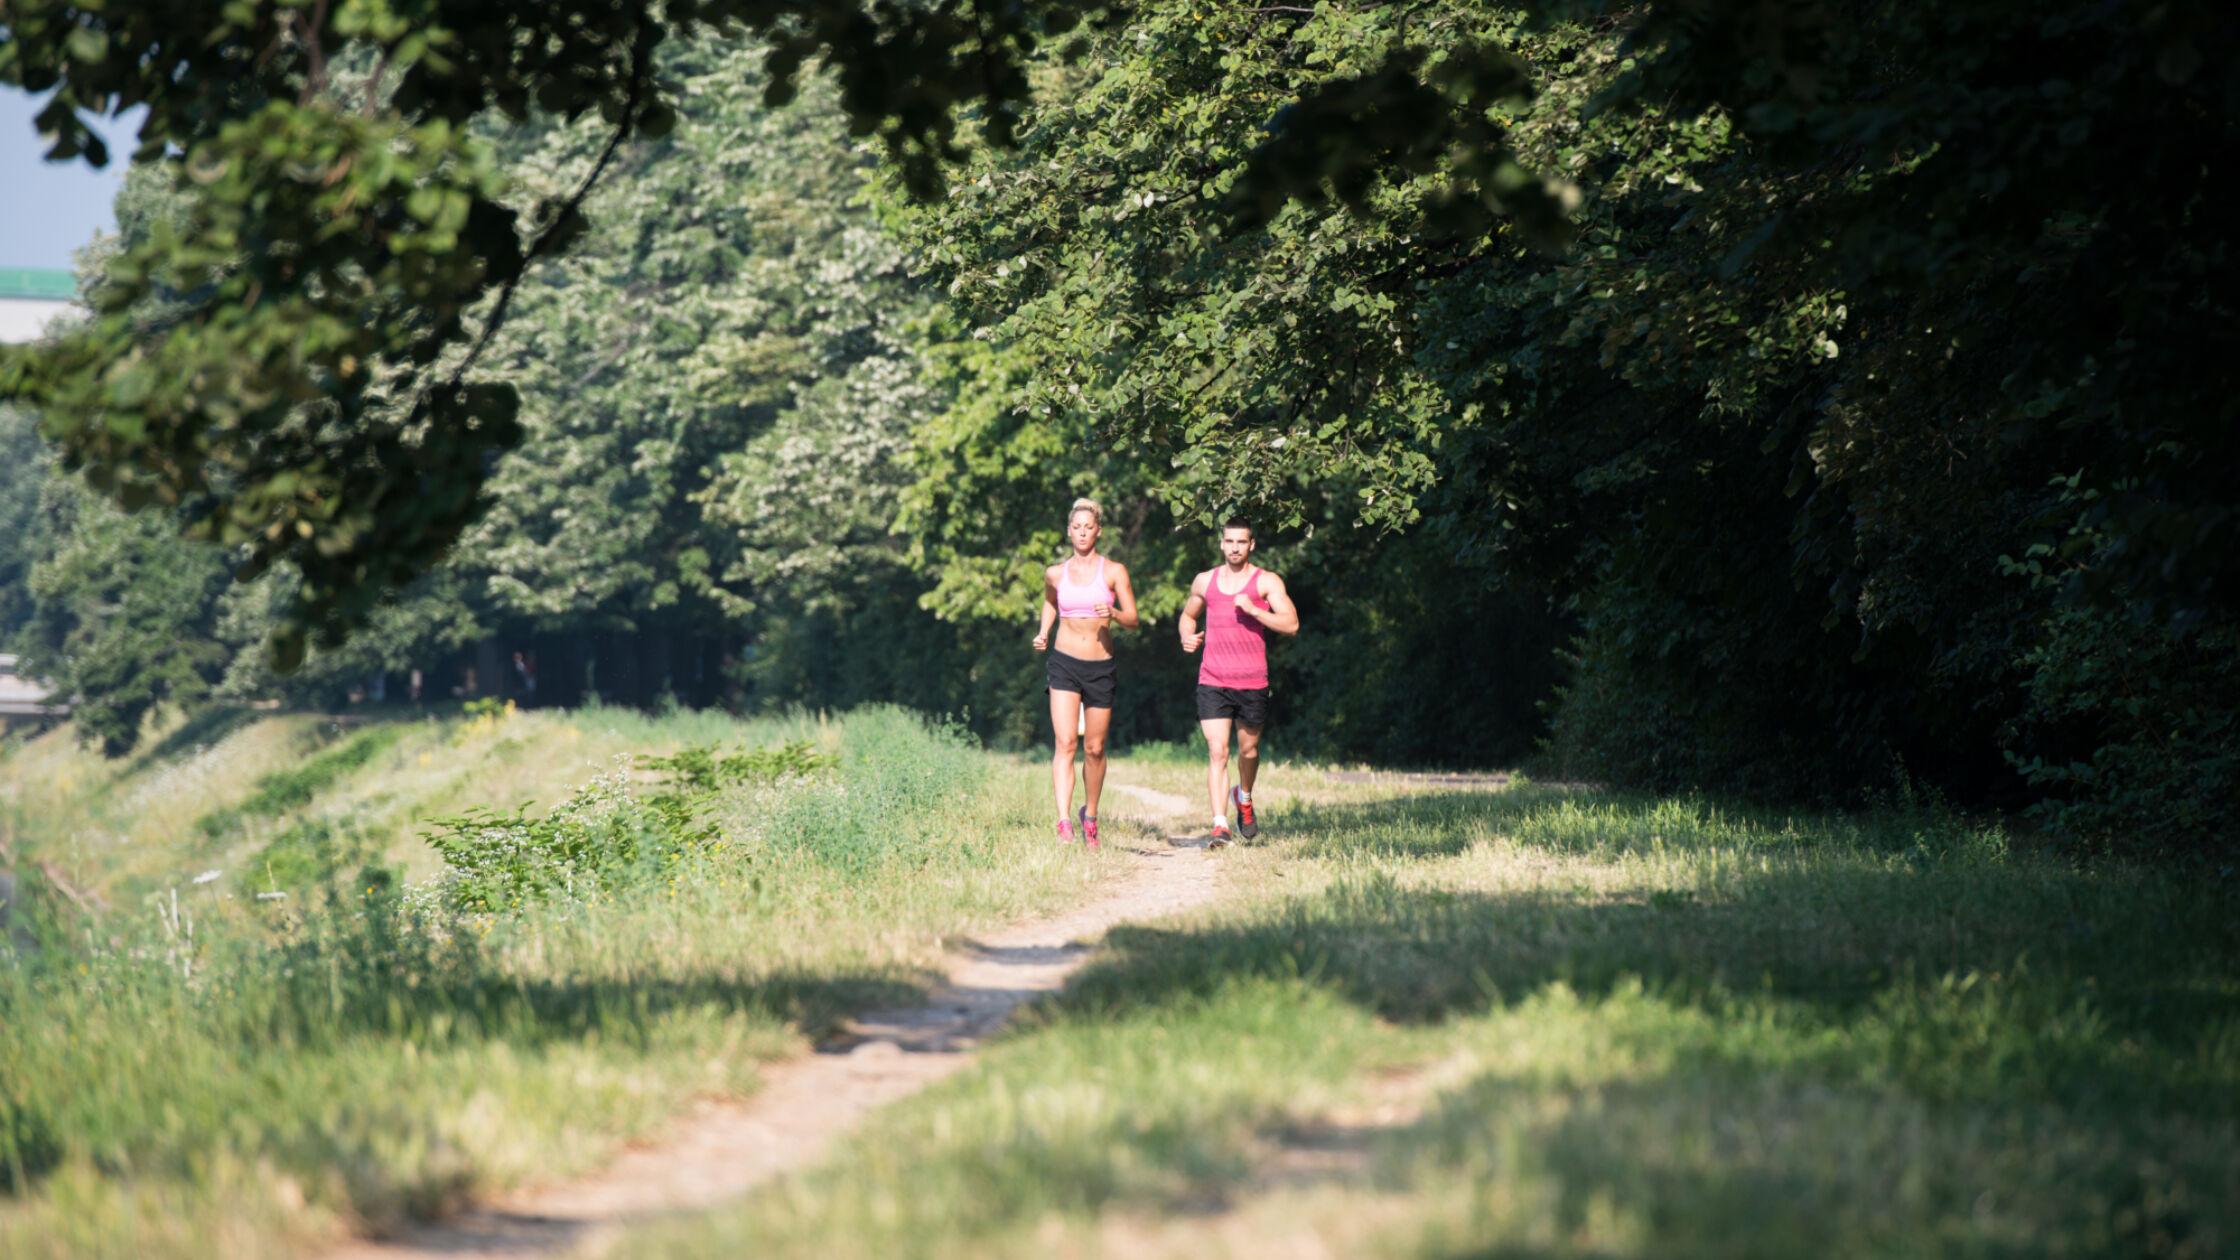 Kom vier dagen hardlopen op de groene Veluwe